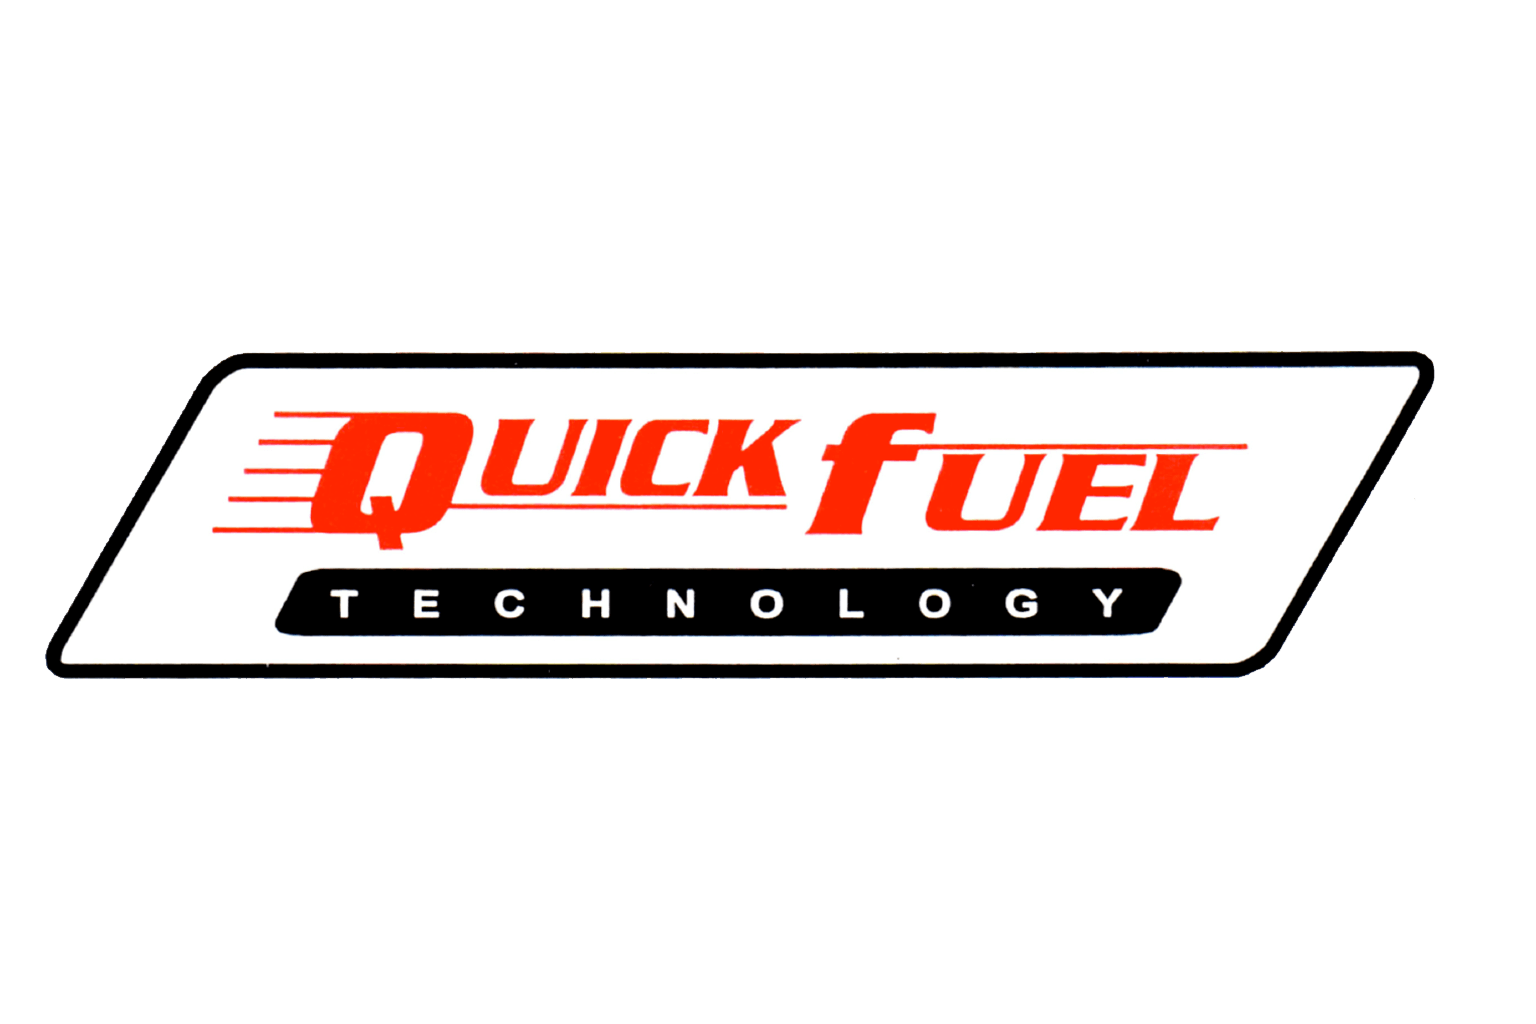 Quick Fuel Technology 21-31QFT Accelerator Pump Nozzle